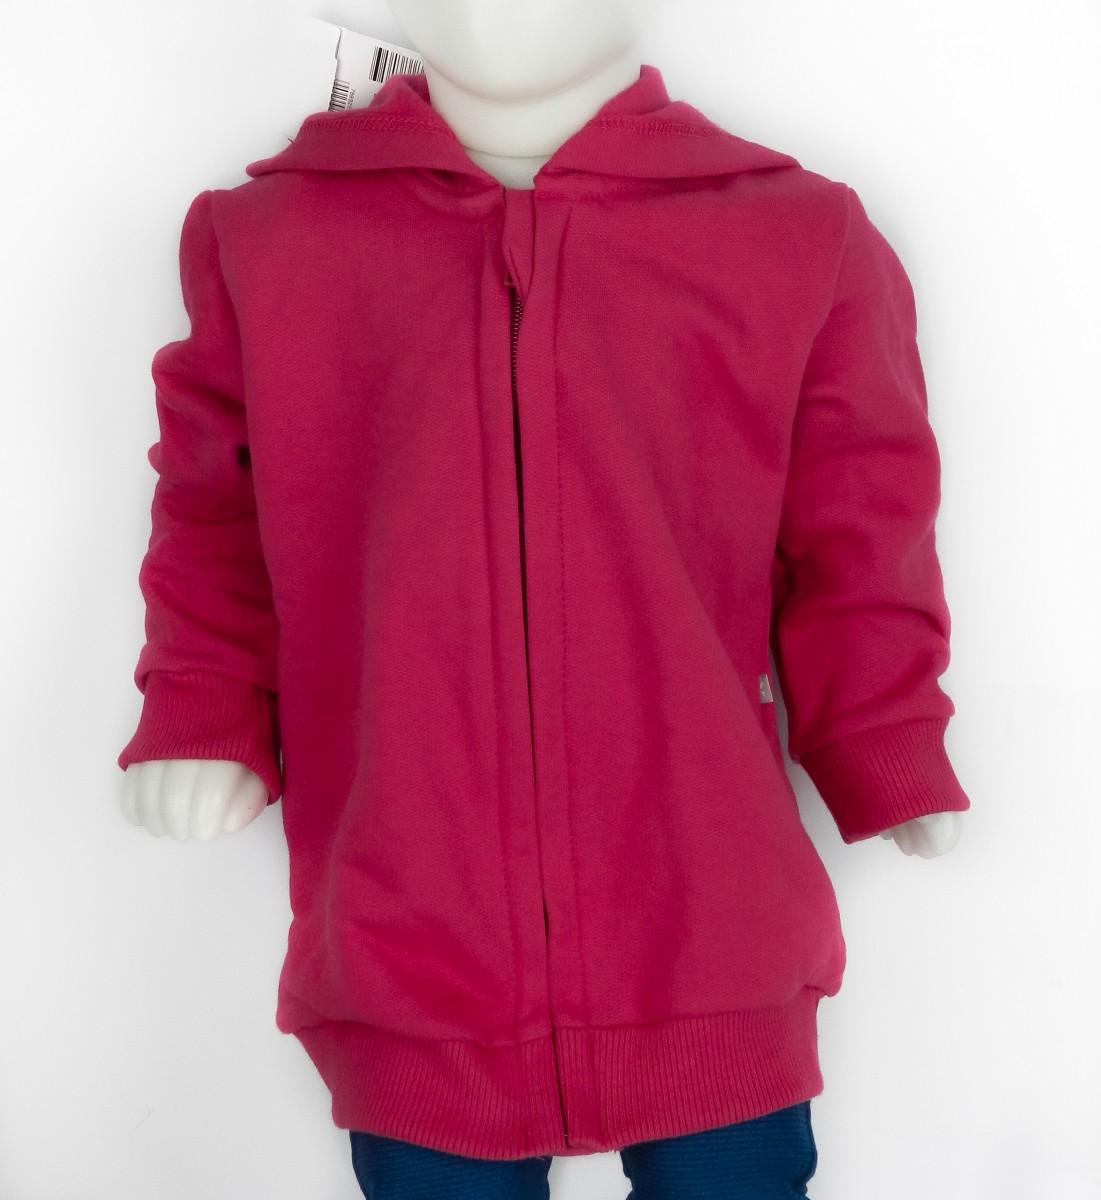 a6ab553bcf Bizz Store - Jaqueta Infantil Feminina Hering Kids Moletom Rosa